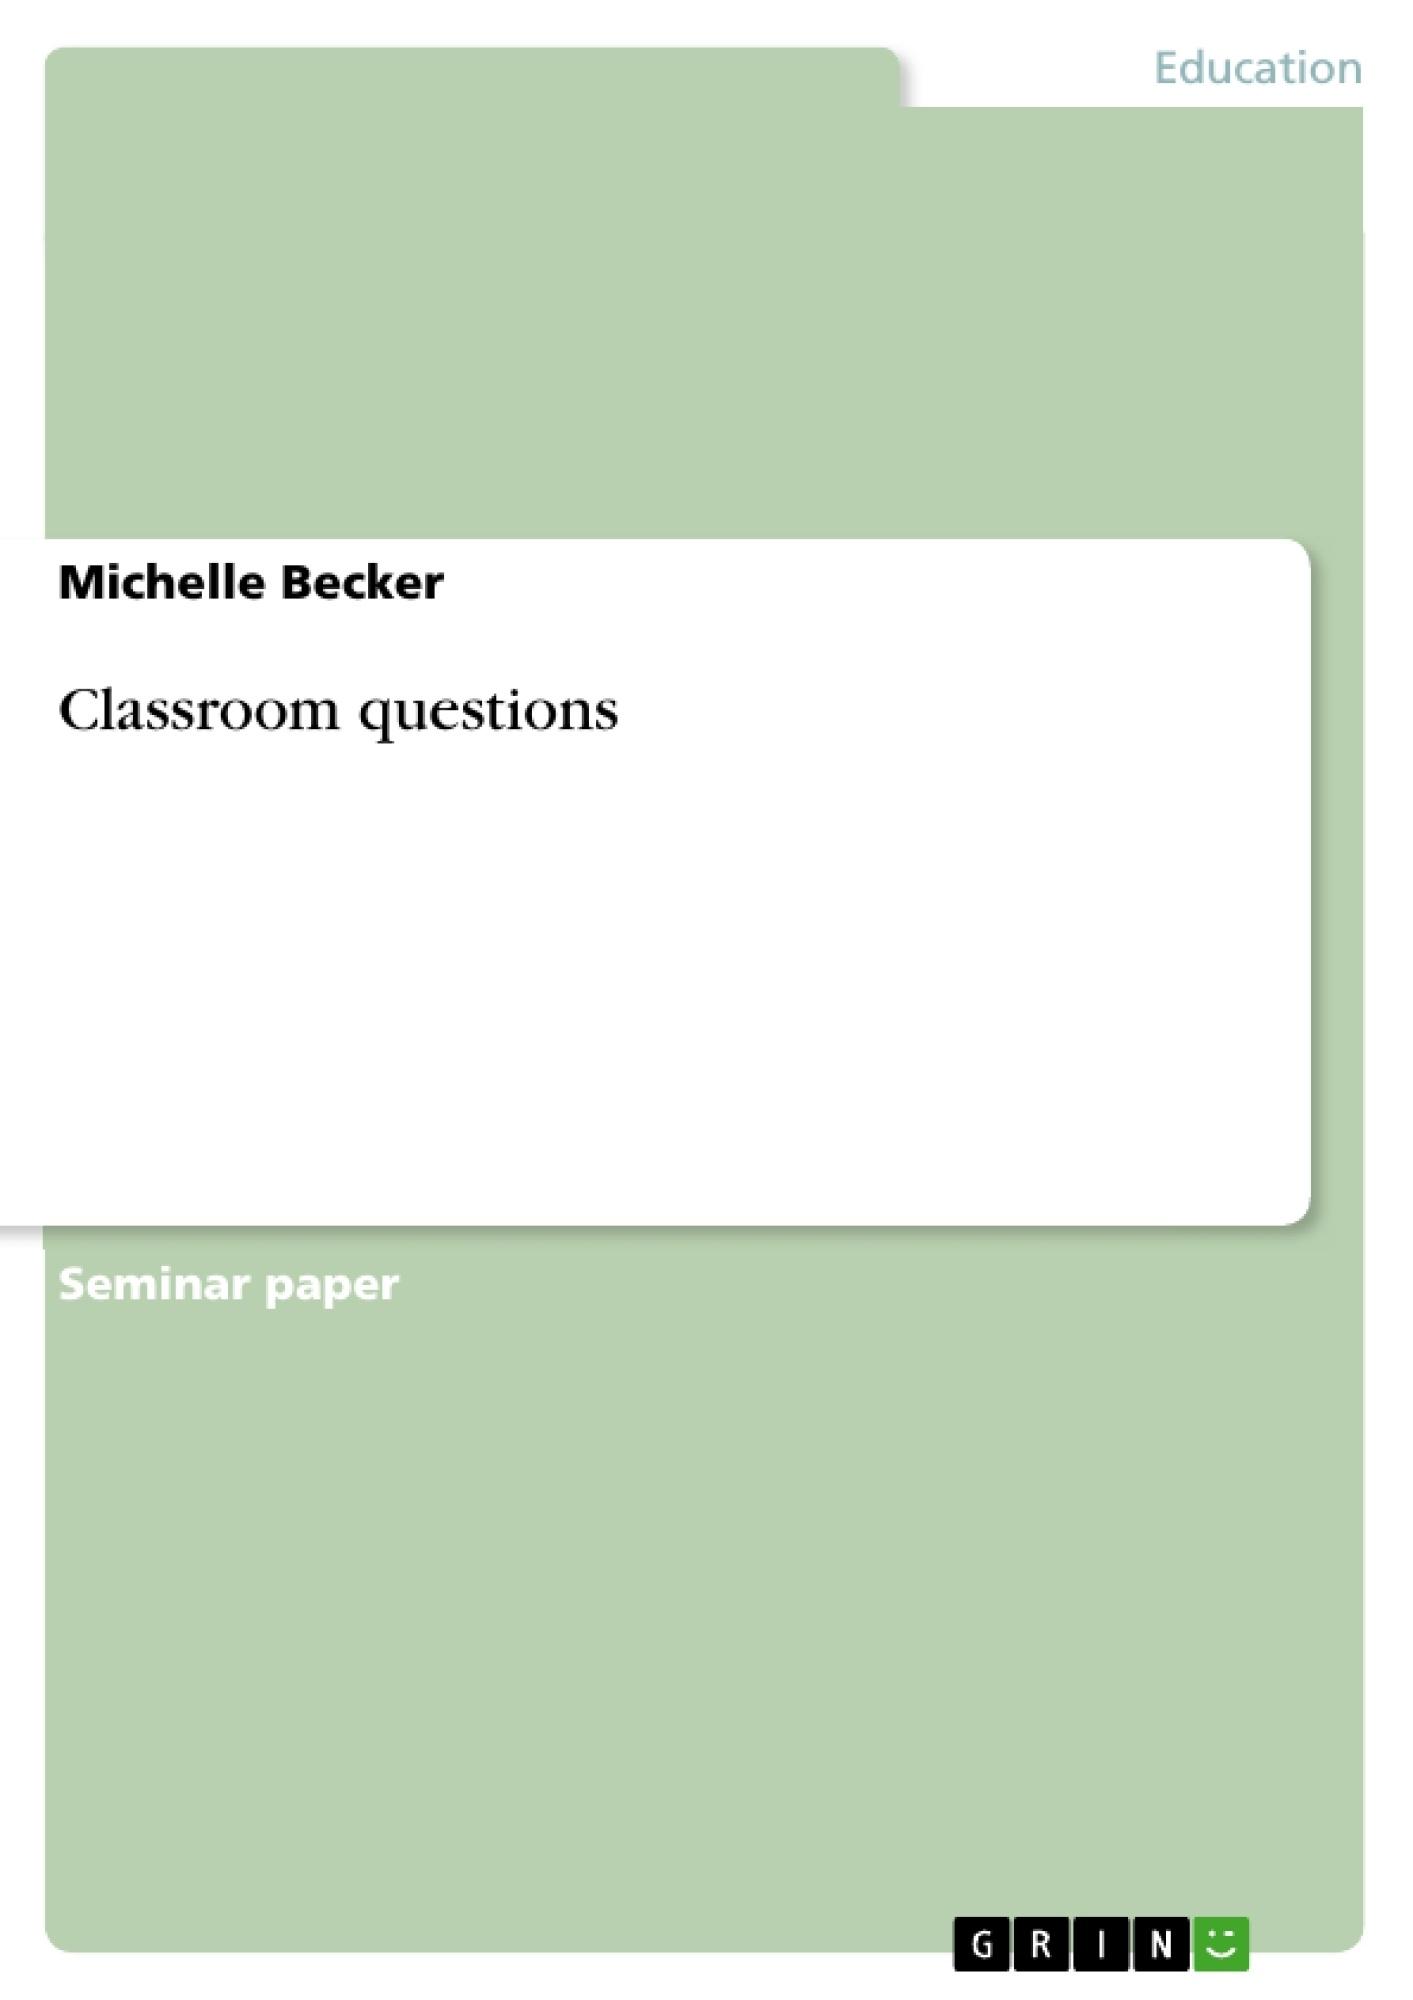 Title: Classroom questions